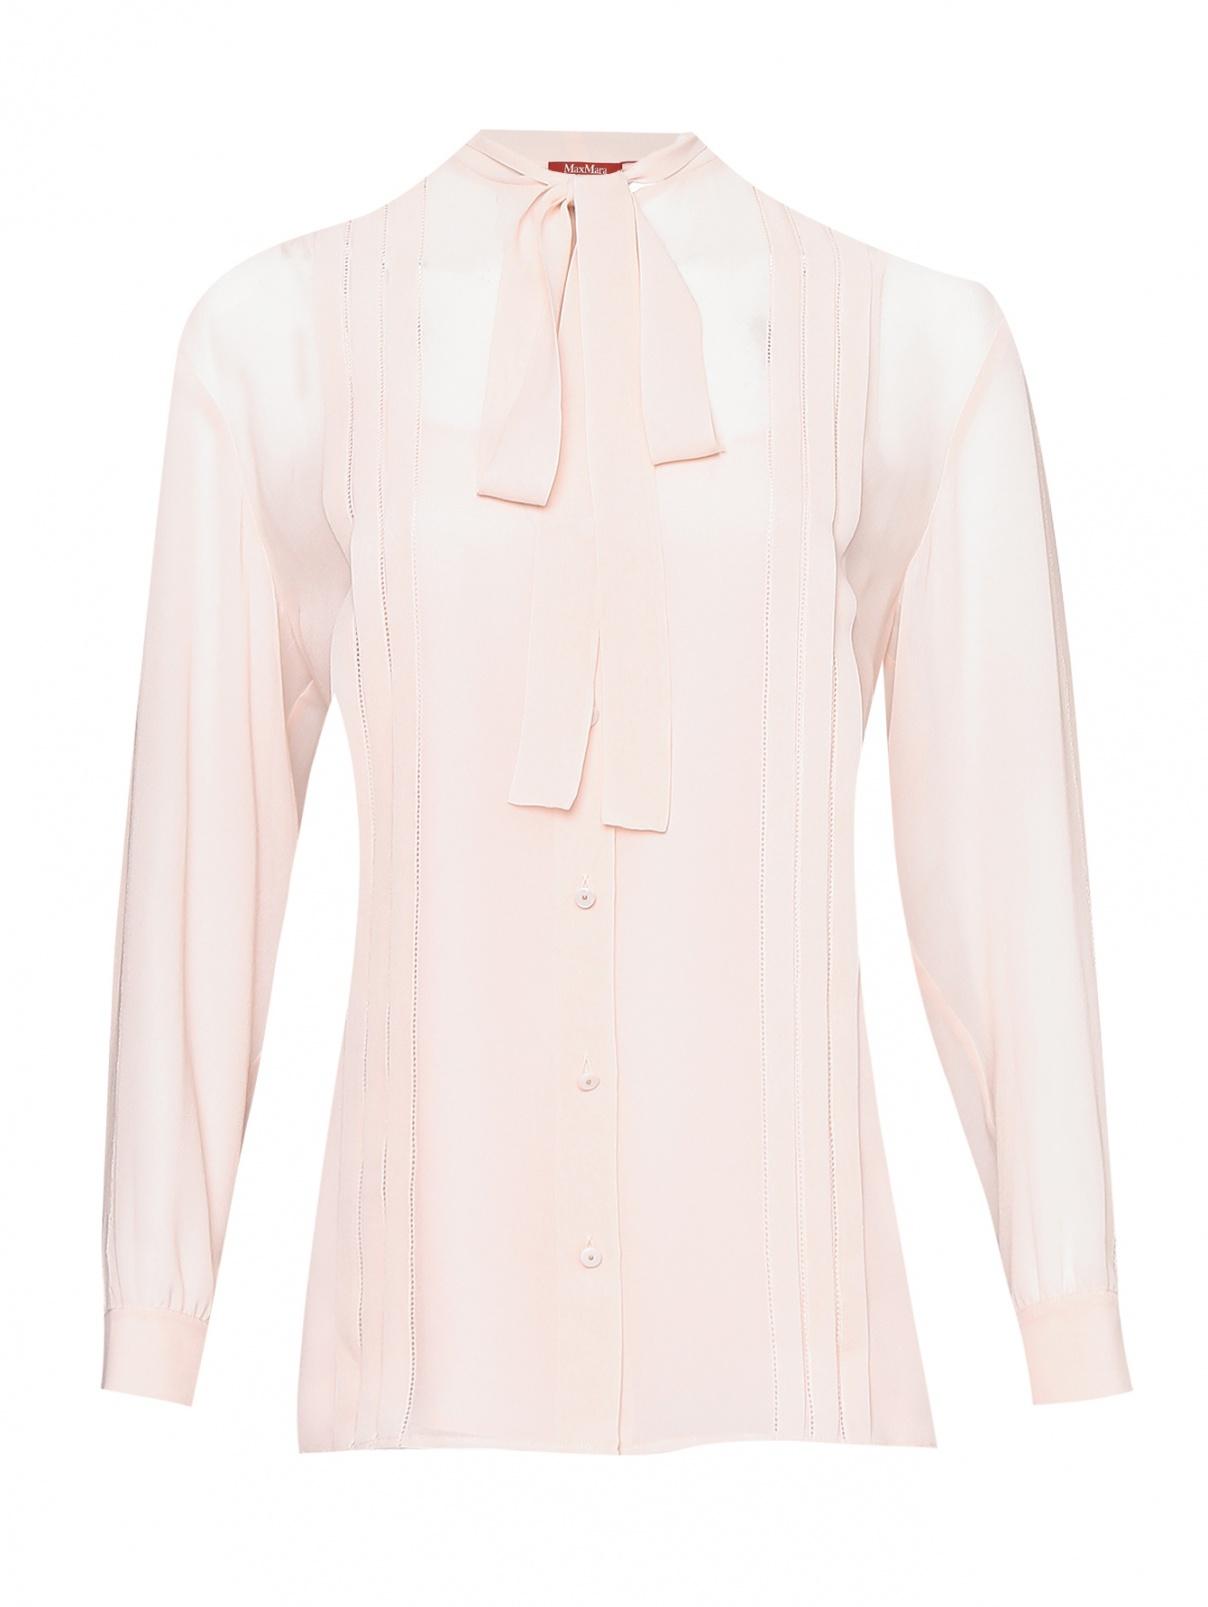 Блуза из шелка на пуговицах Max Mara  –  Общий вид